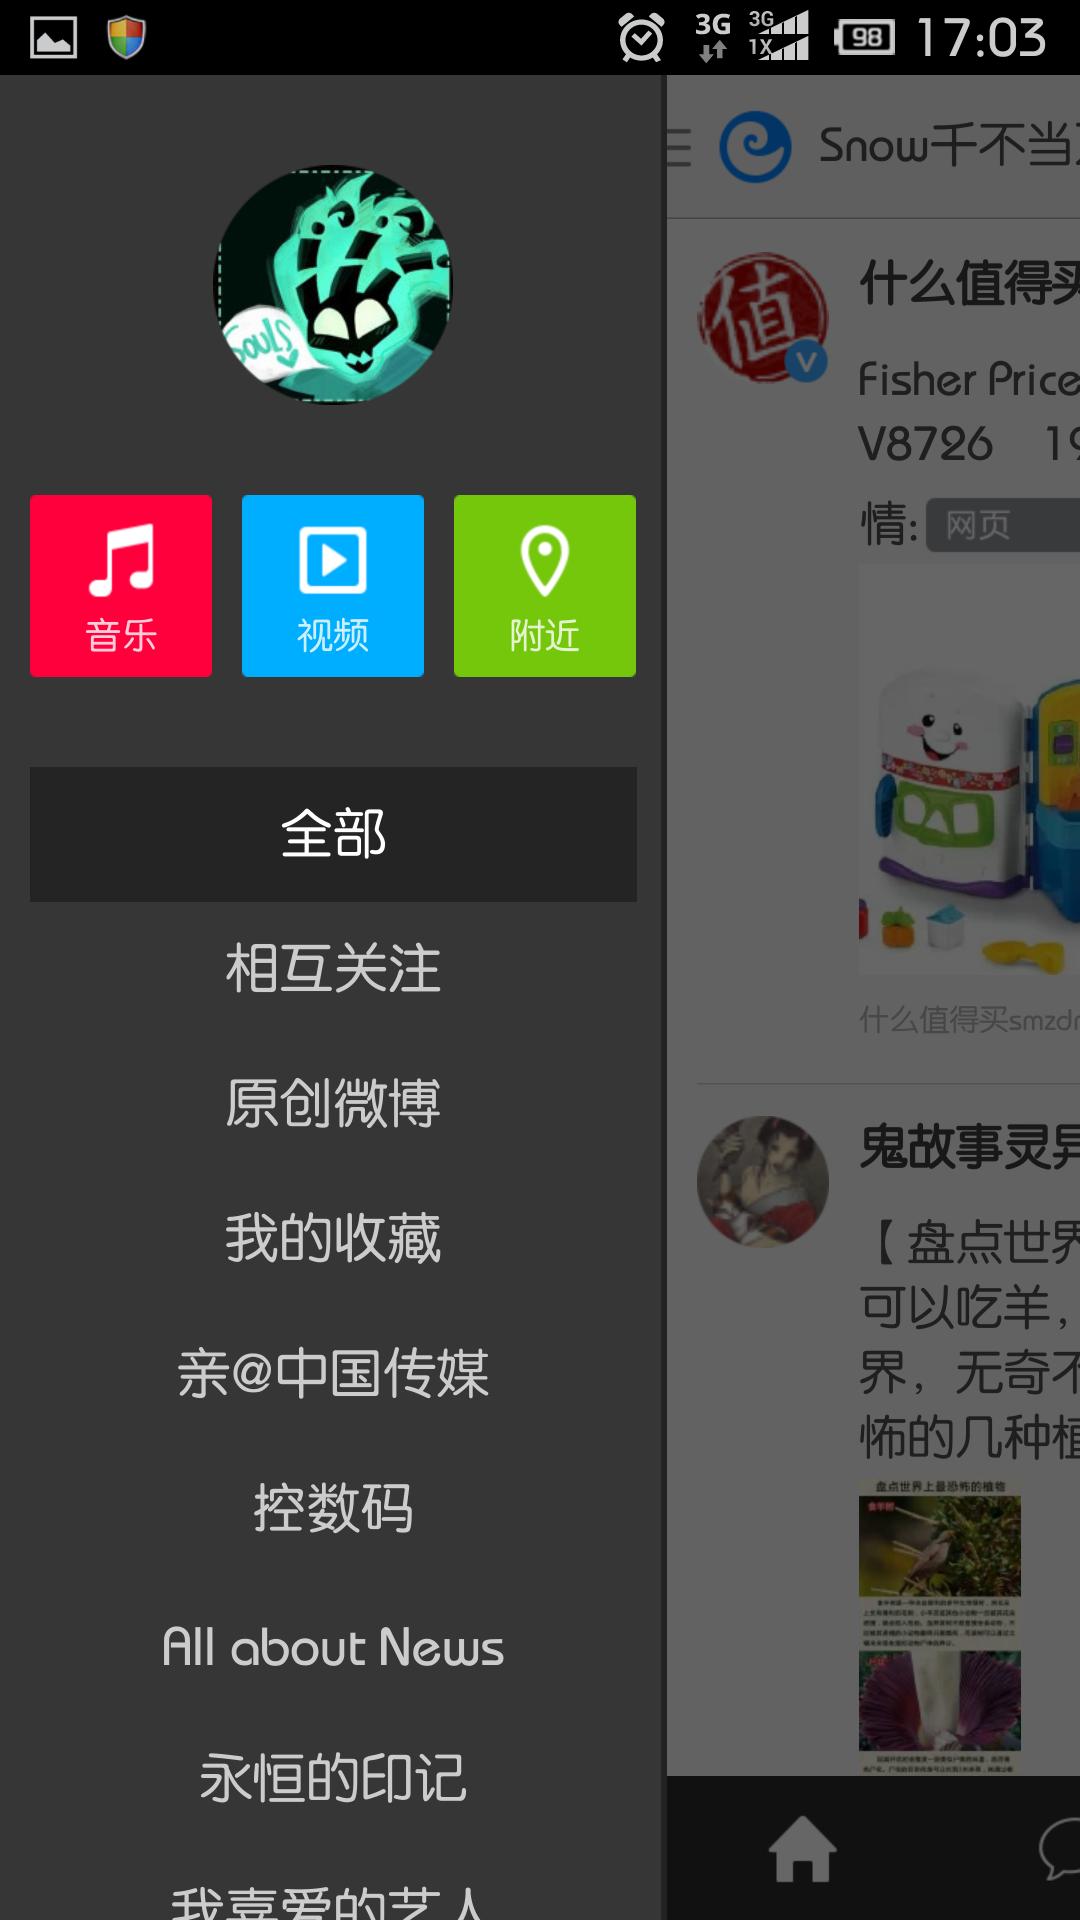 Screenshot_2013-11-05-17-03-40.png